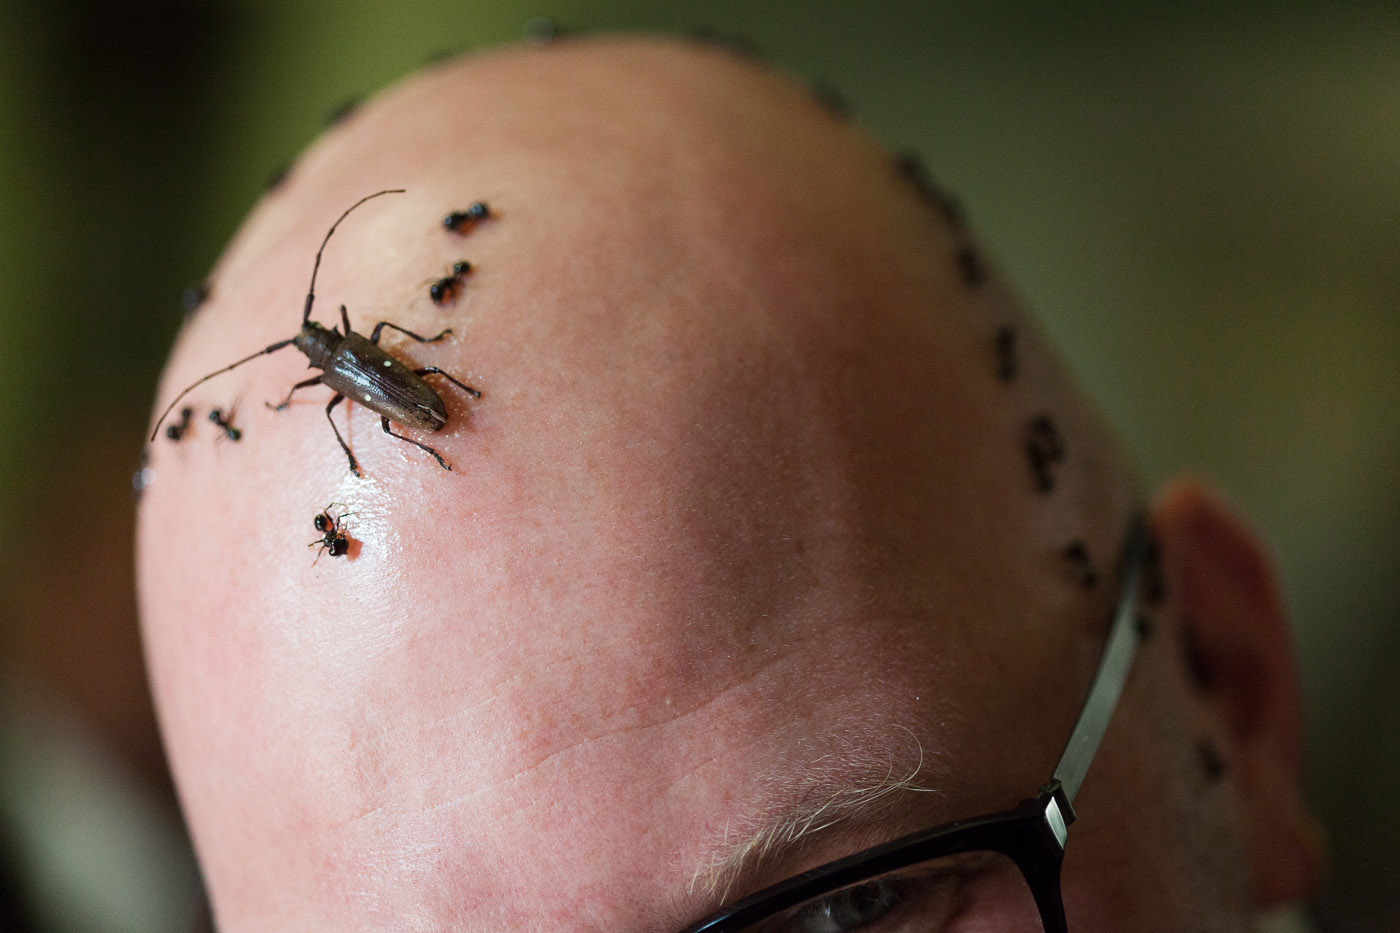 Insect and Creepy Crawly Themed Wedding Tessa Matthew Rock n